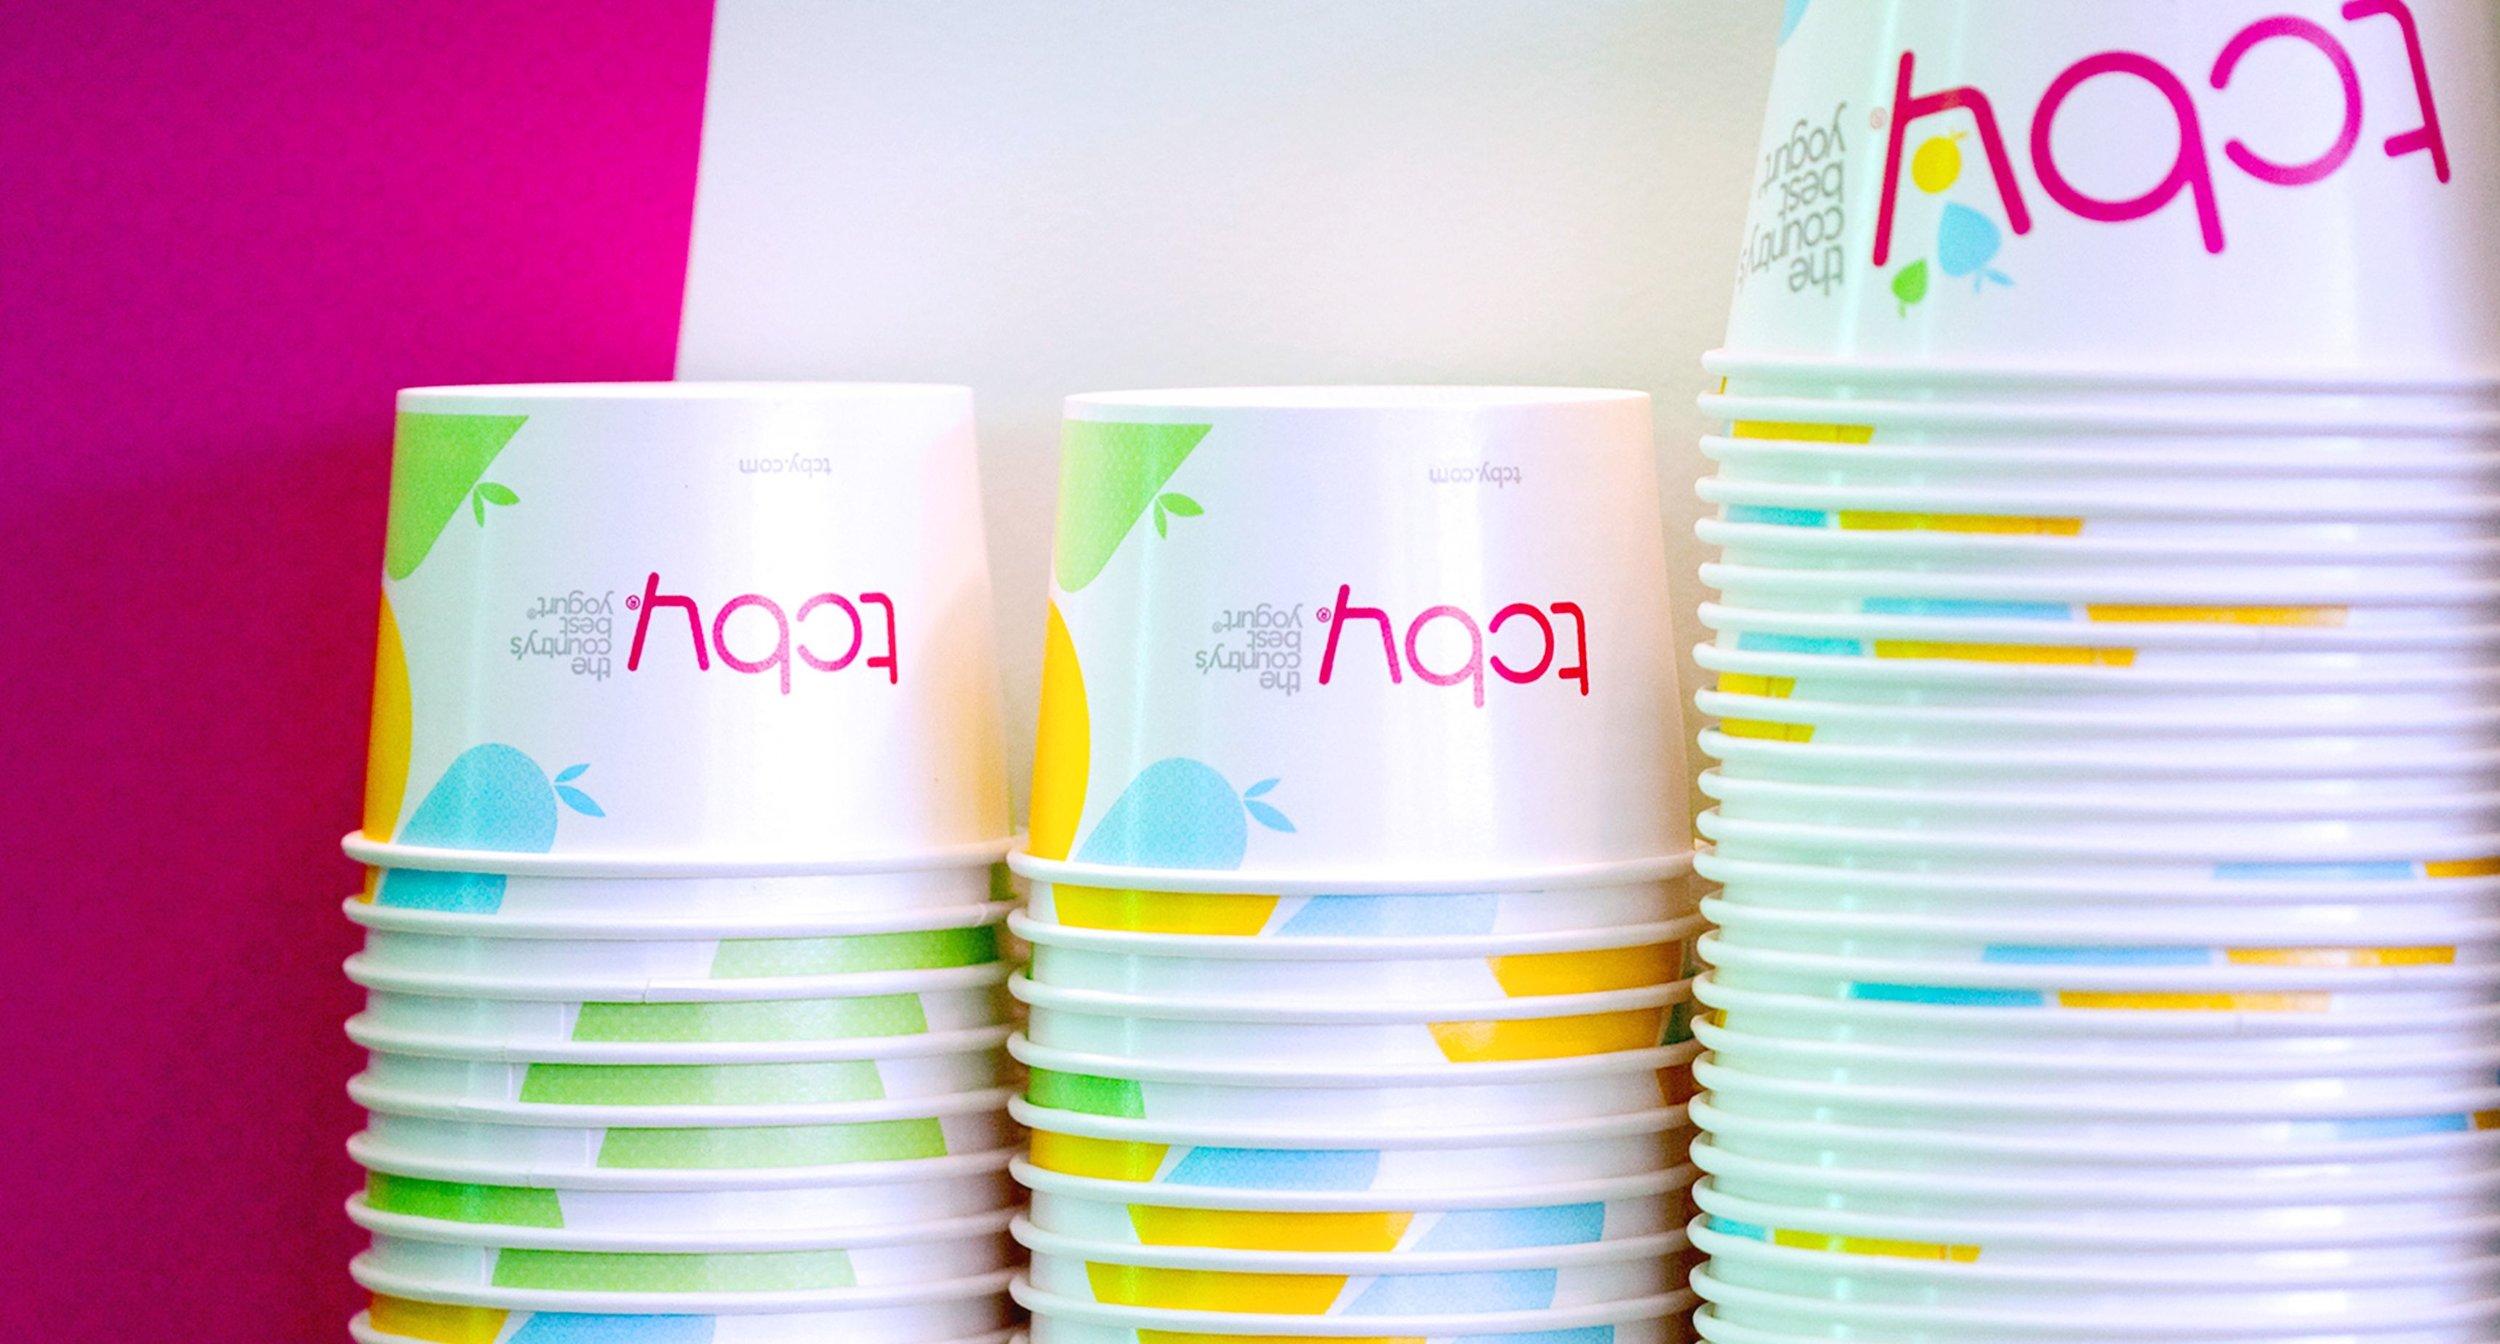 TCBY Yogurt Cups